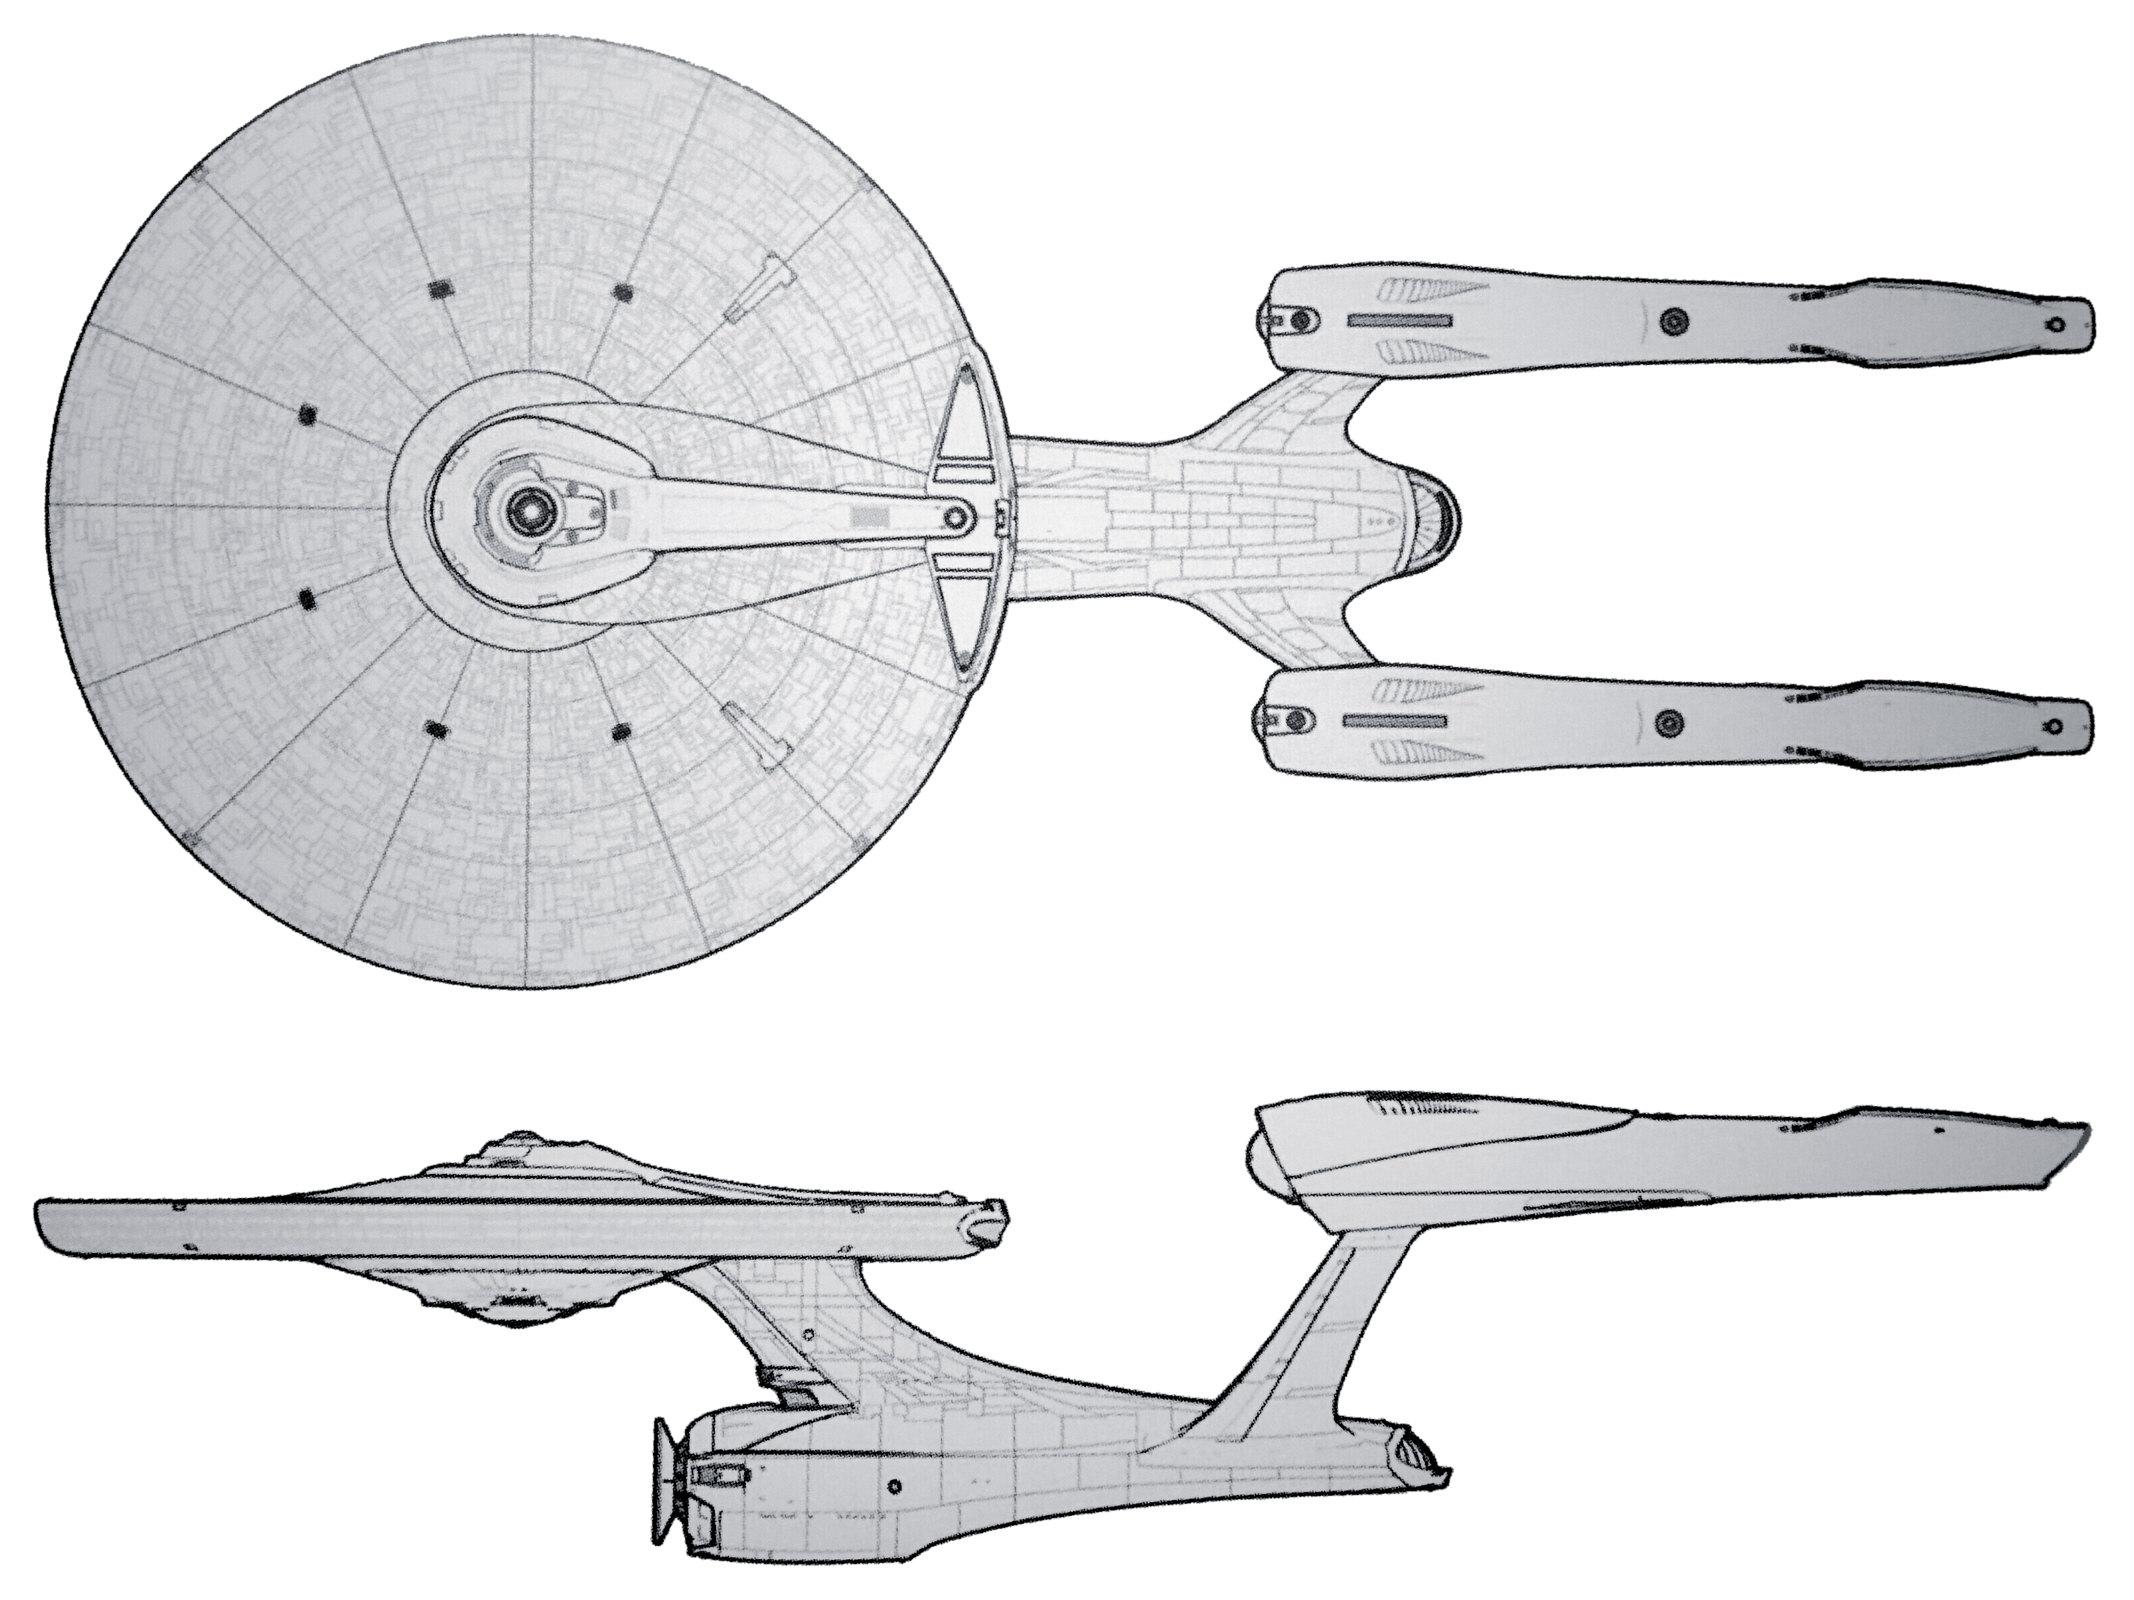 uss enterprise diagram river meander ex astris scientia starship gallery abramsverse federation vessels stb redesign sketch the art of star trek kelvin timeline